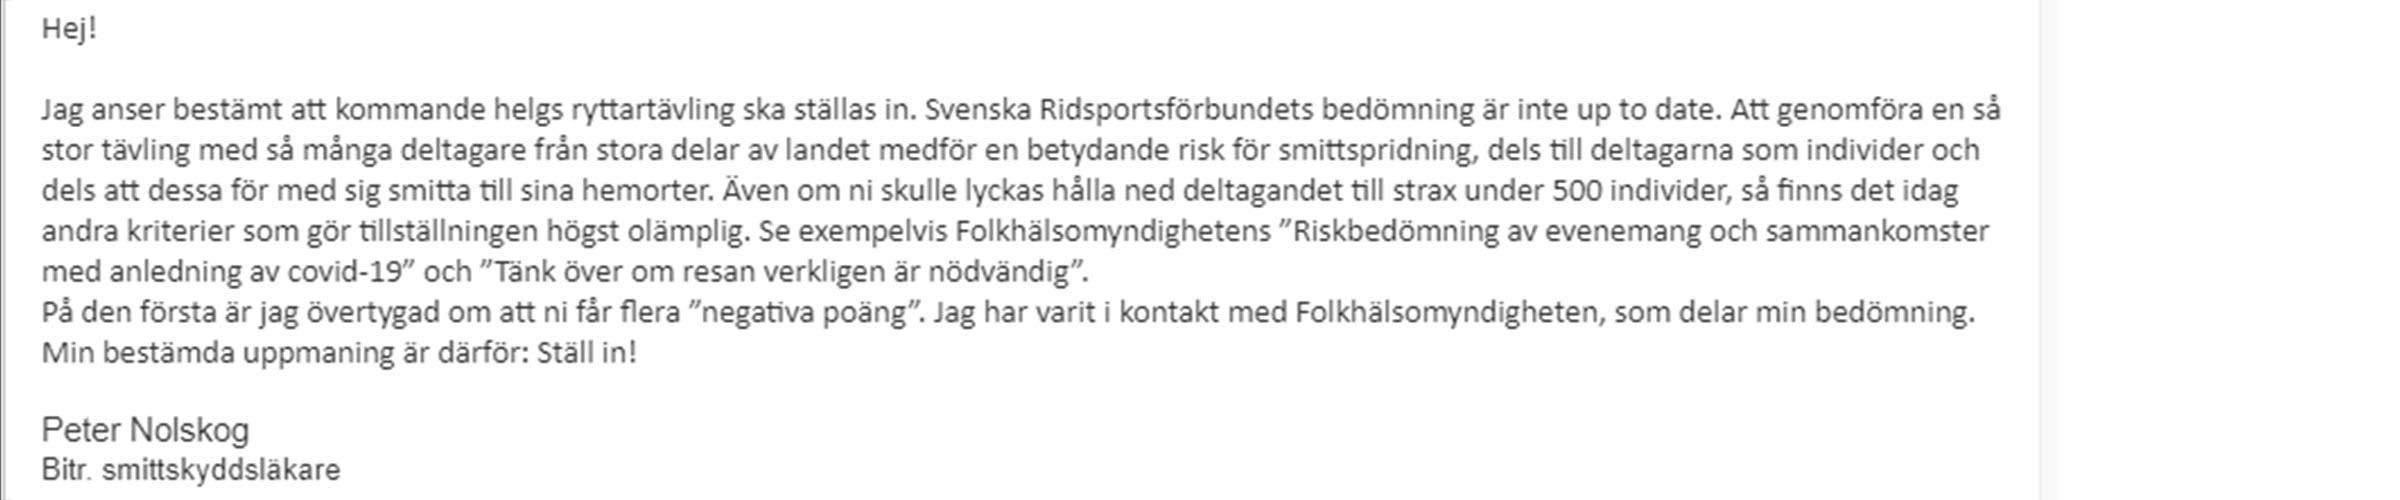 Smittlakarens_mejl